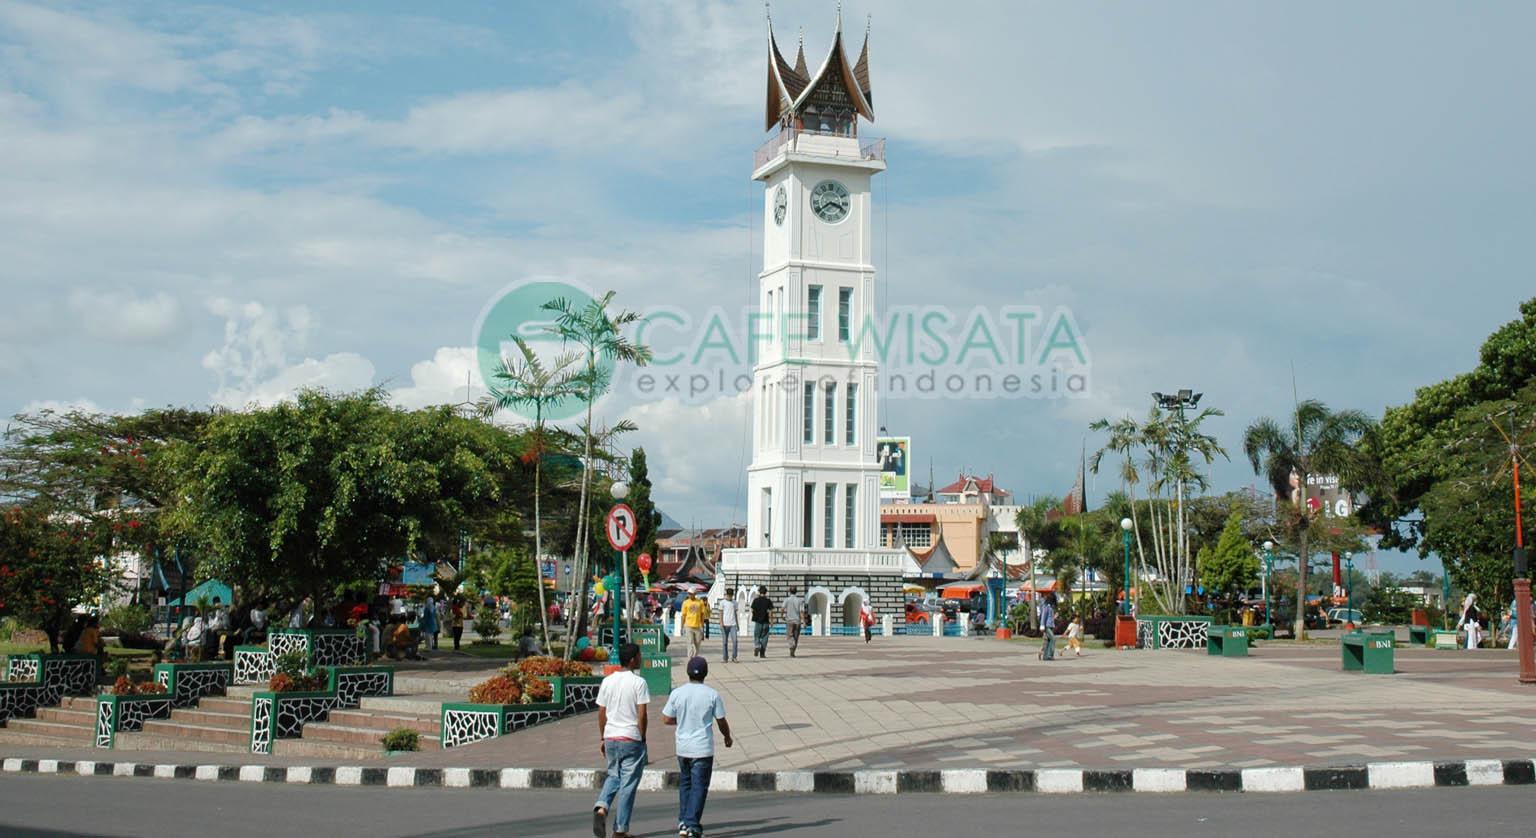 Nominasi Tempat Wisata Keren Padang Sumatera Barat Cafe Bagi Berlibur